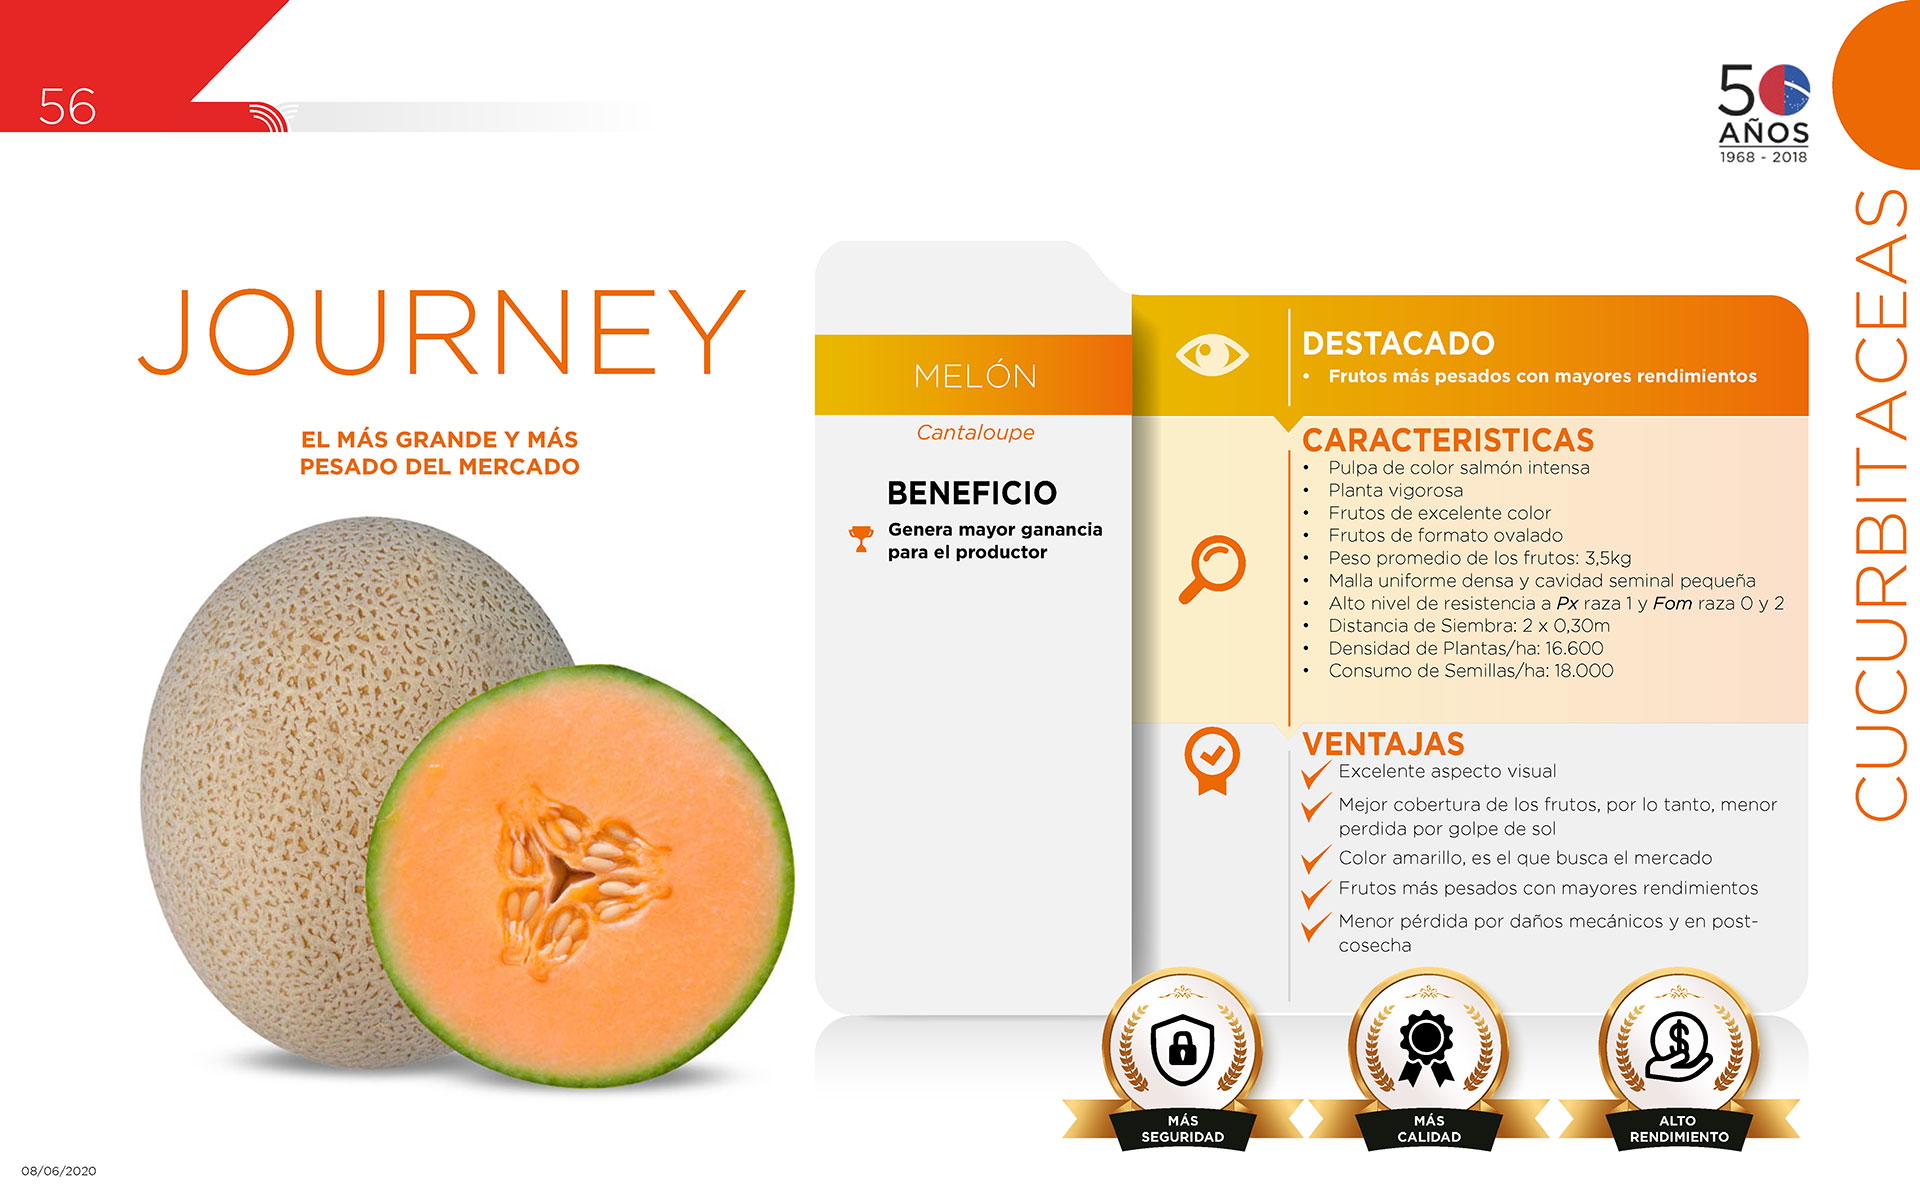 Journey - Cucurbitaceas